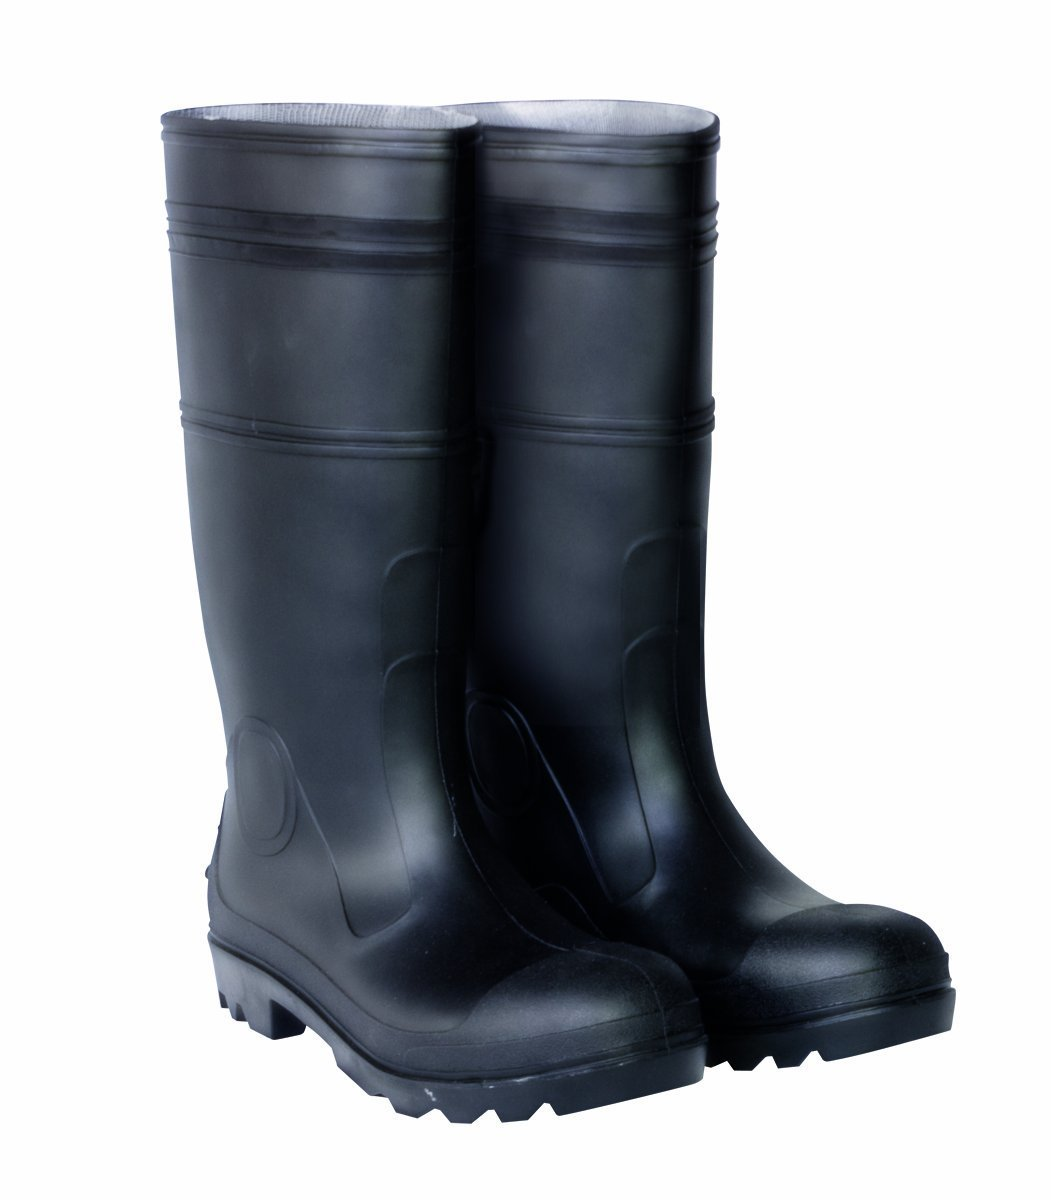 CLC Custom Leathercraft R23010 Over The Sock Black PVC Men's Rain Boot, Size 10 by Honeywell